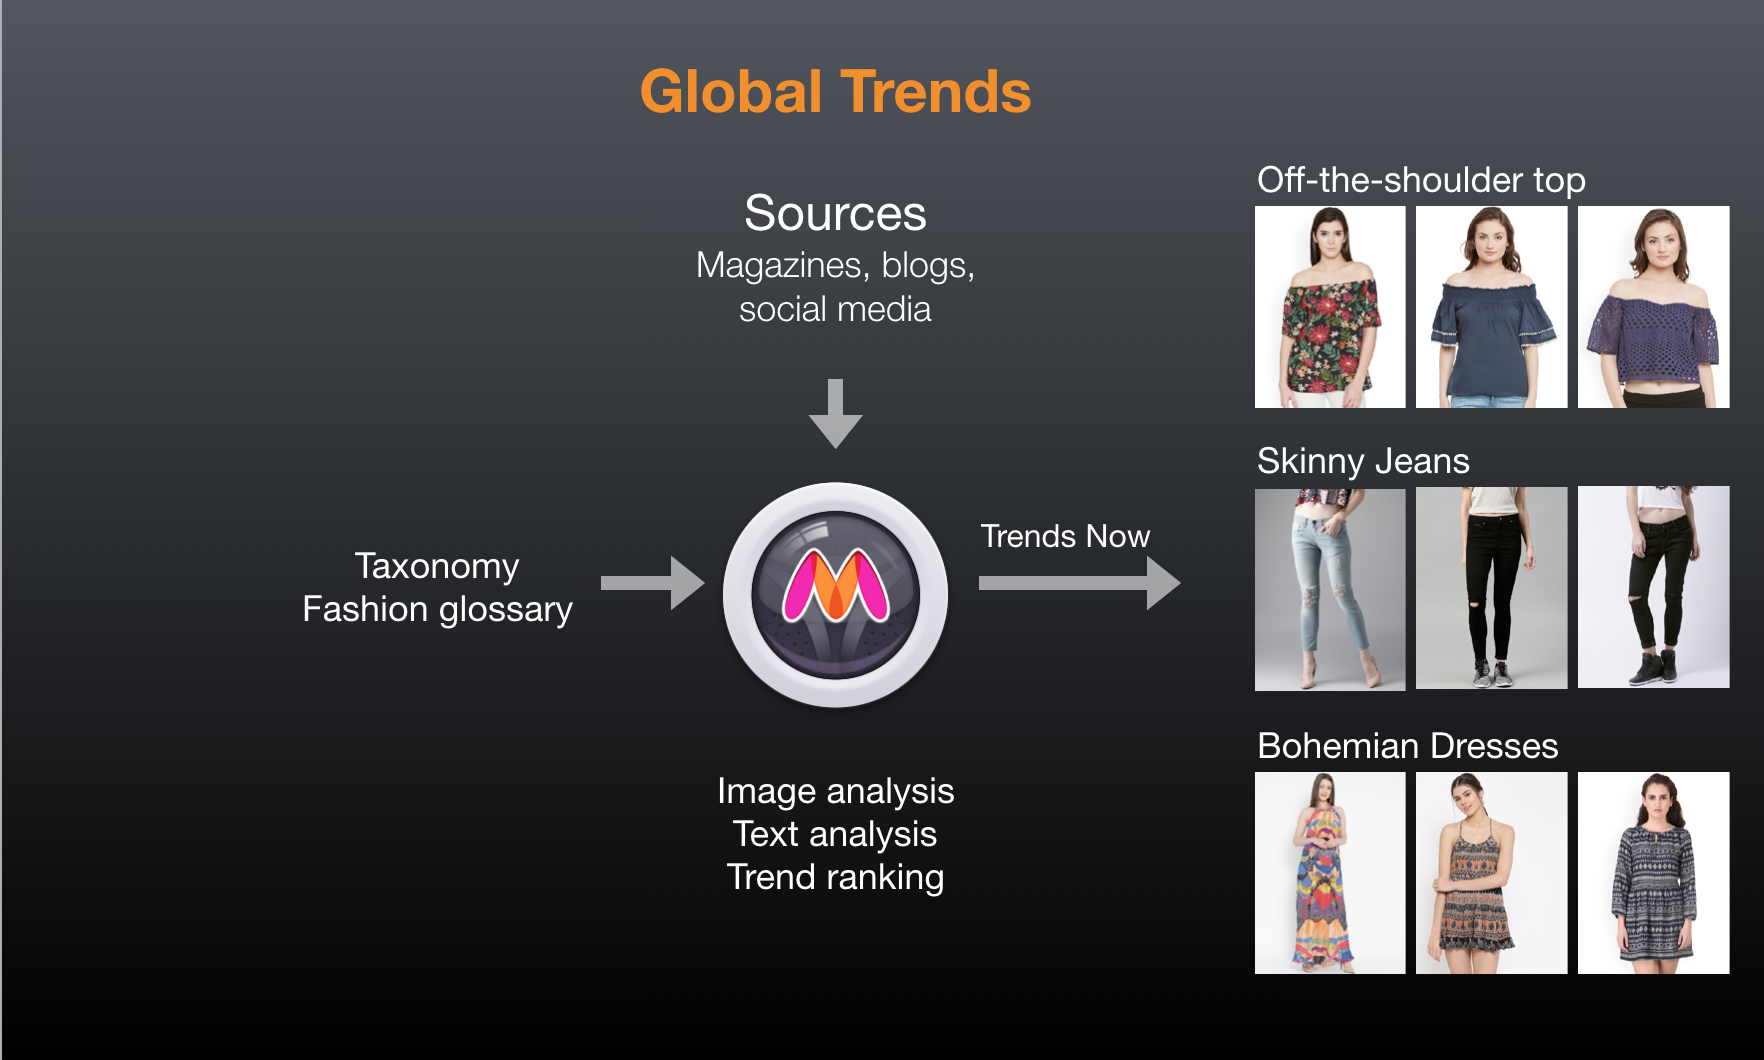 identifying fashion trends